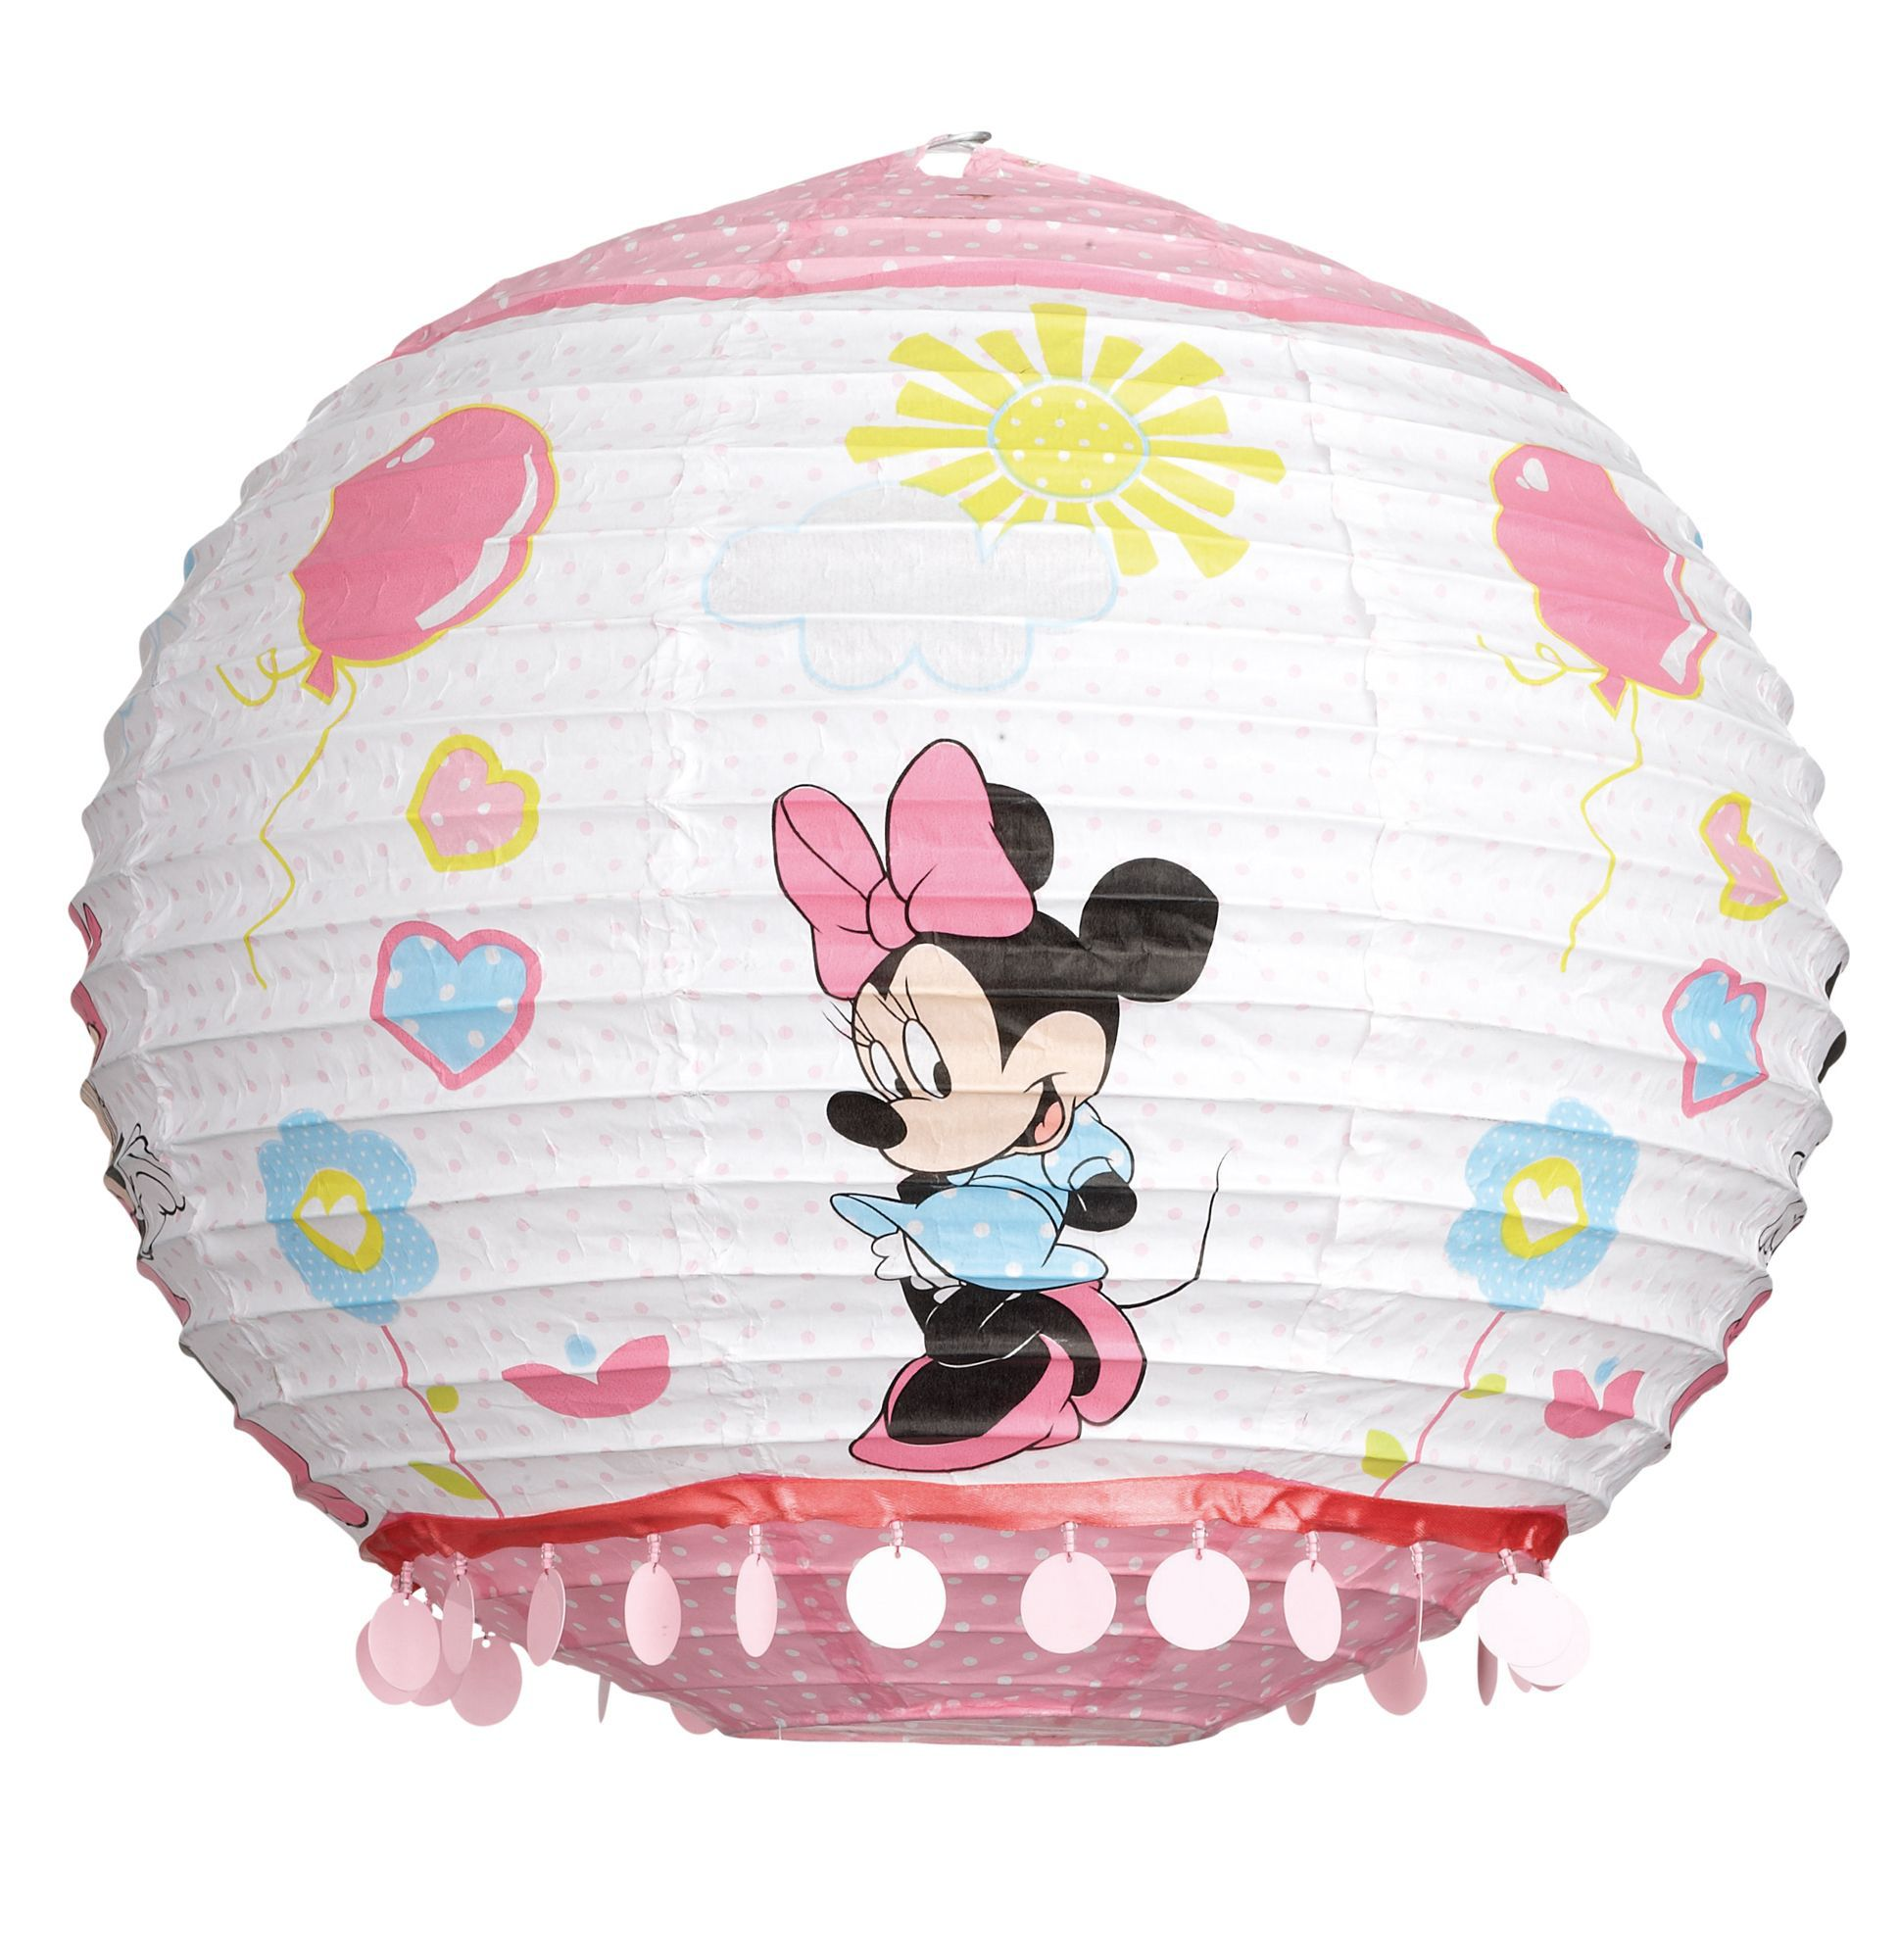 Minnie mouse lamp shade pinkdisney minnie mouse hello gorgeous lamp disney pink disney minnie mouse light shade d 350mm aloadofball Image collections